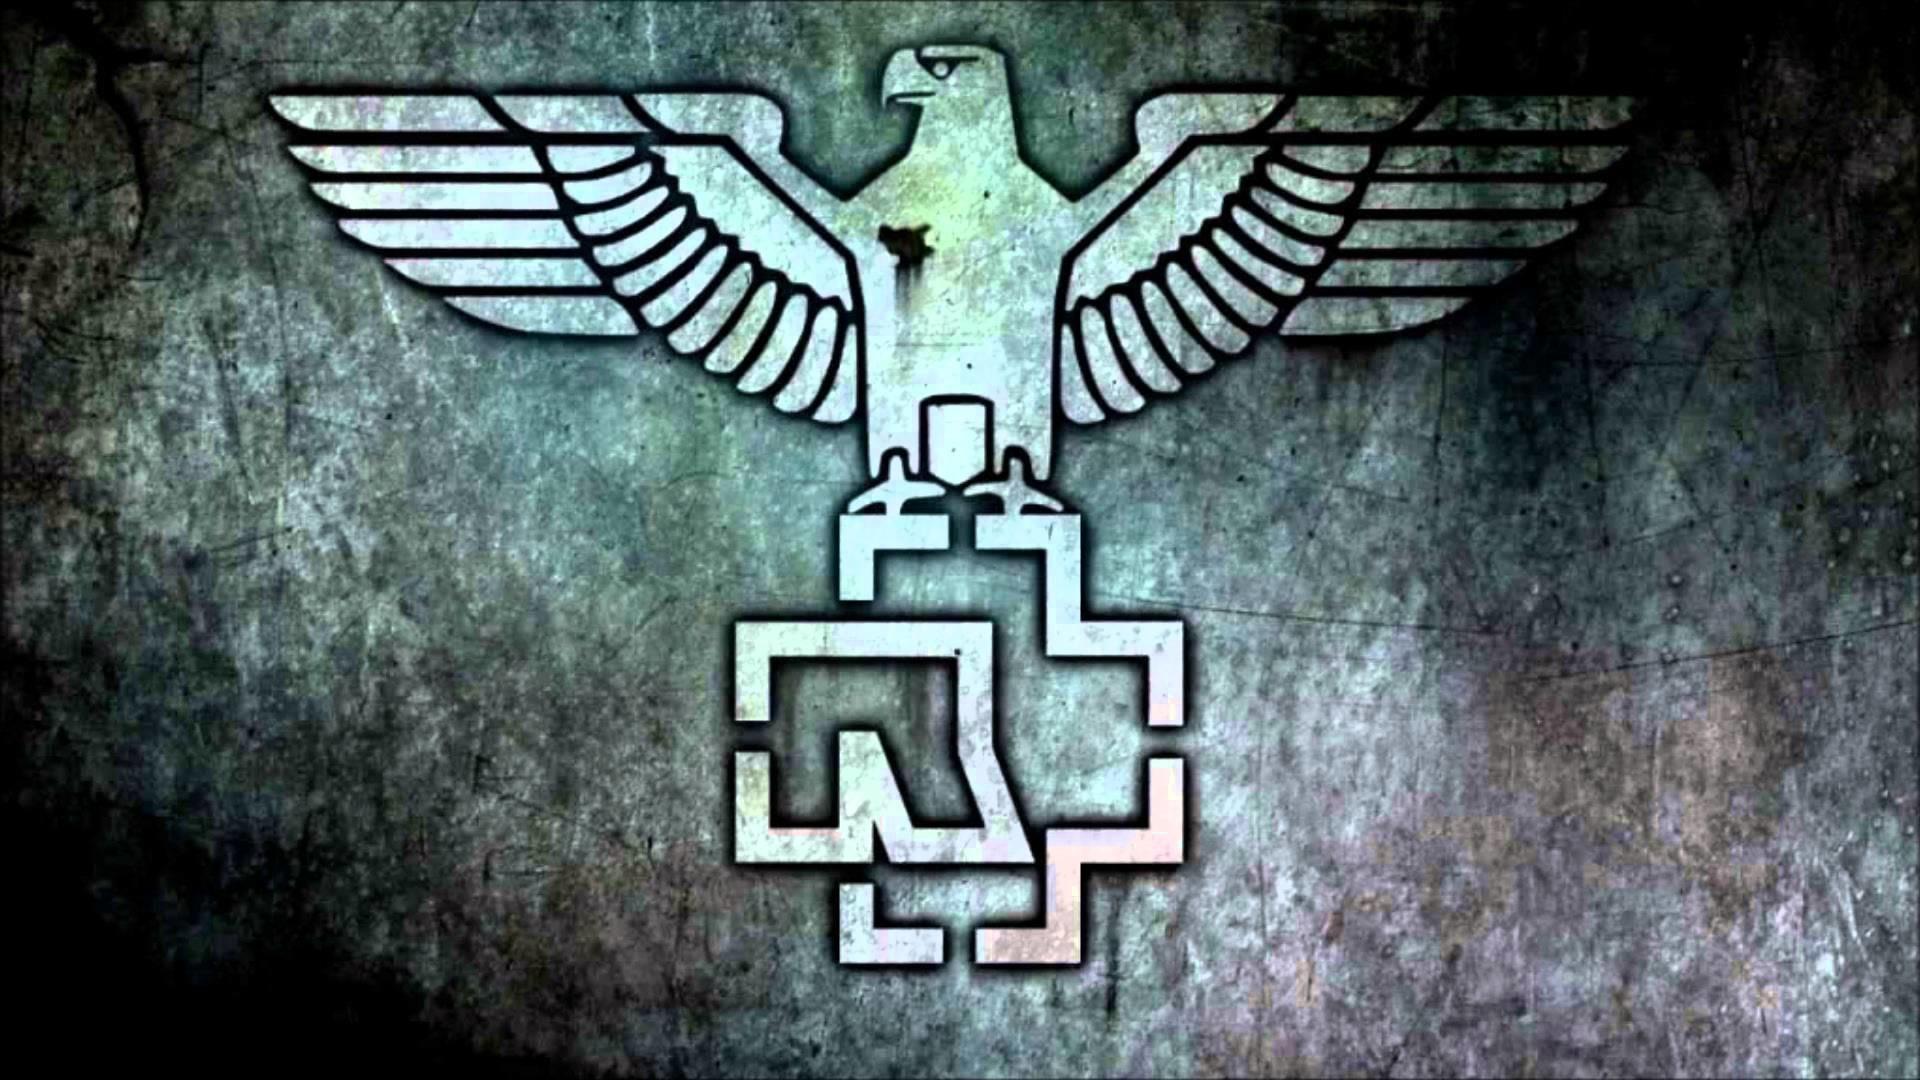 1920x1080 Rammstein Wallpaper Download